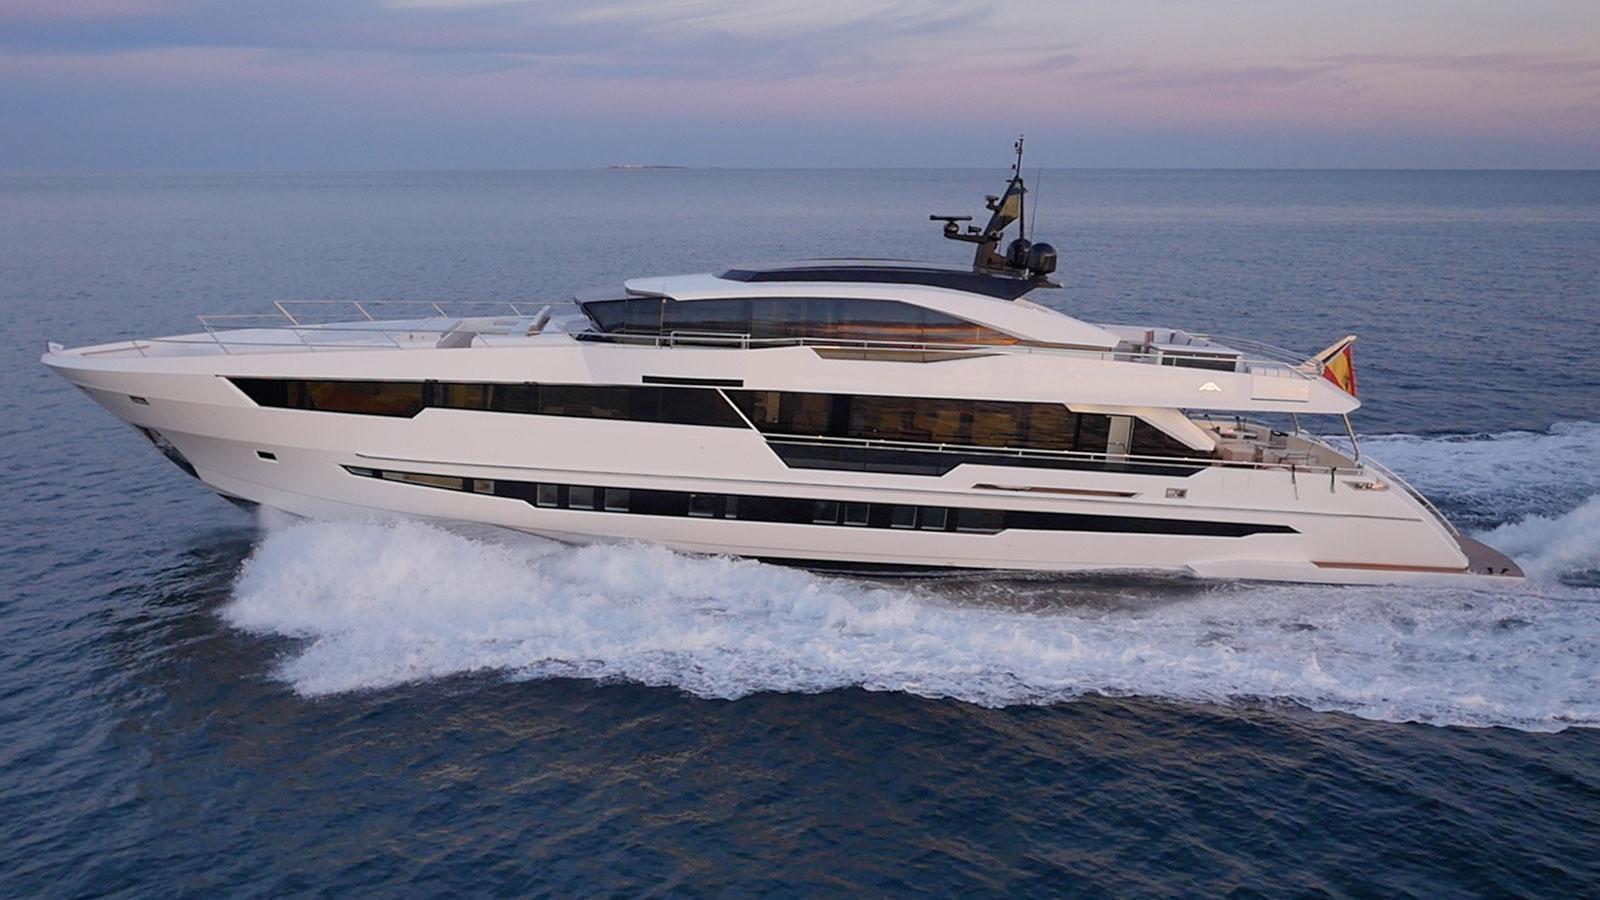 motoryacht-astondoa-century-110-2018-33m-cruising-sistership